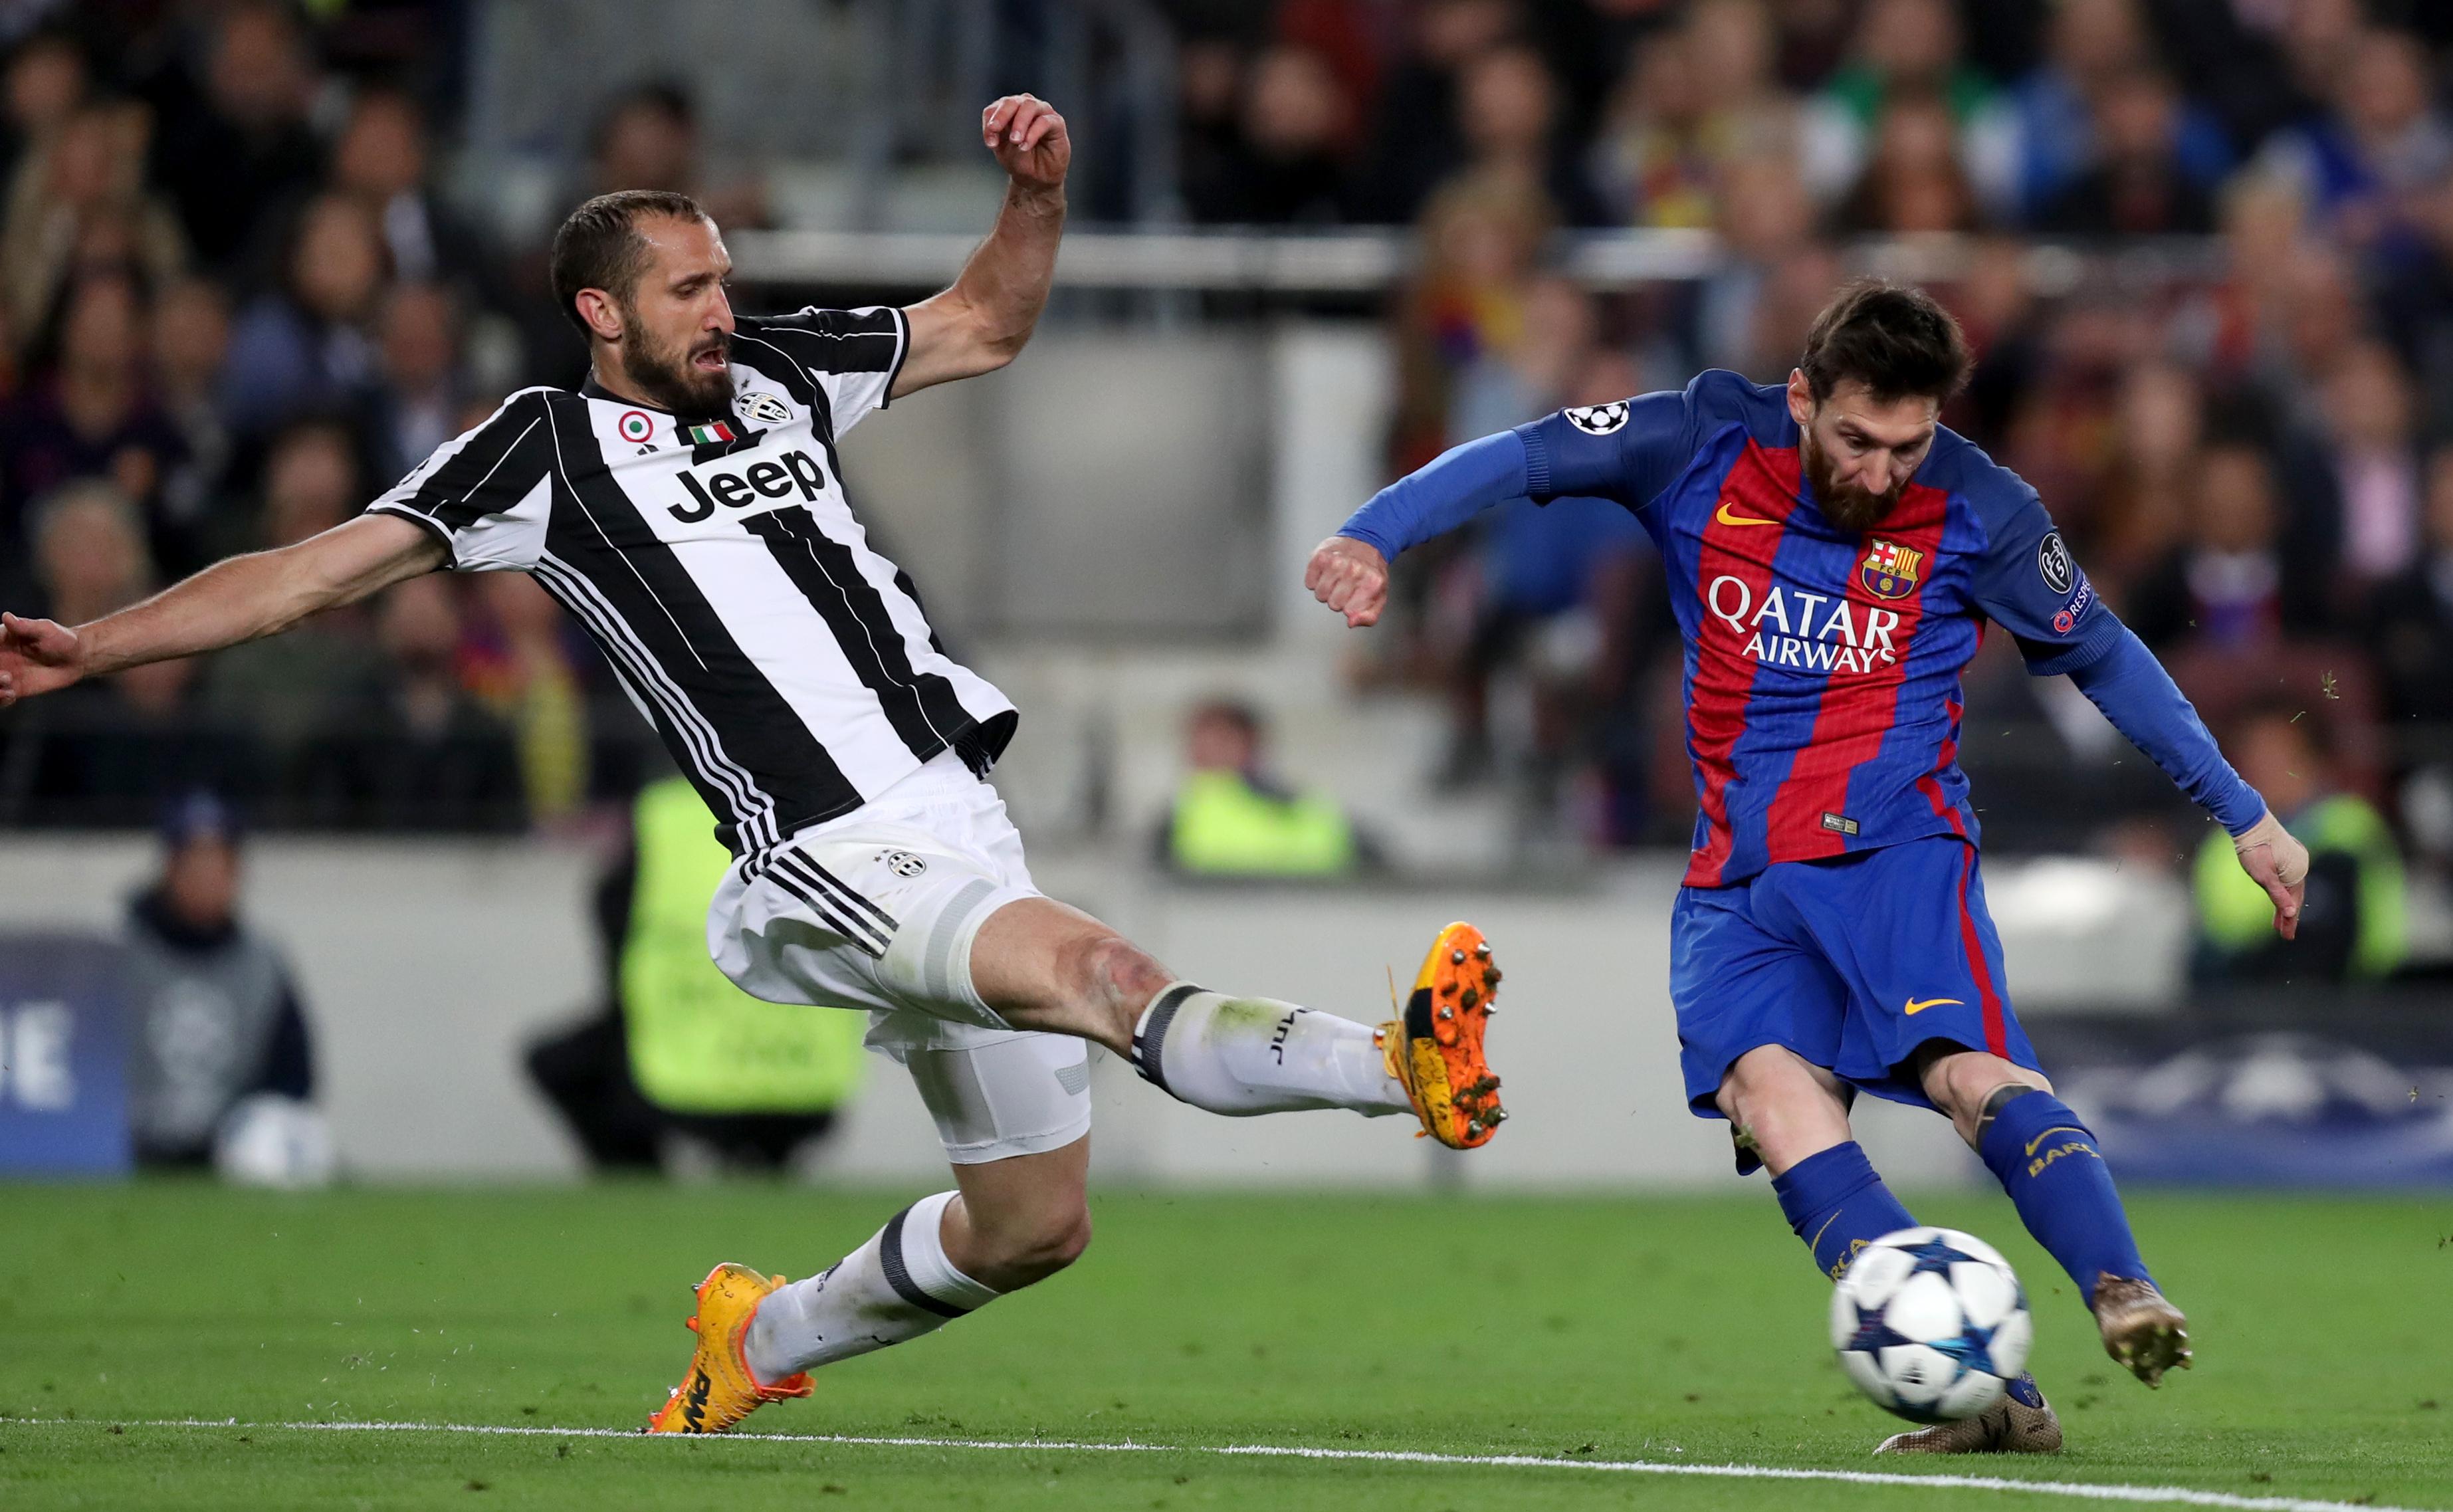 WATCH Bonucci And Chiellini Have A Friendly Fight Over Messi s